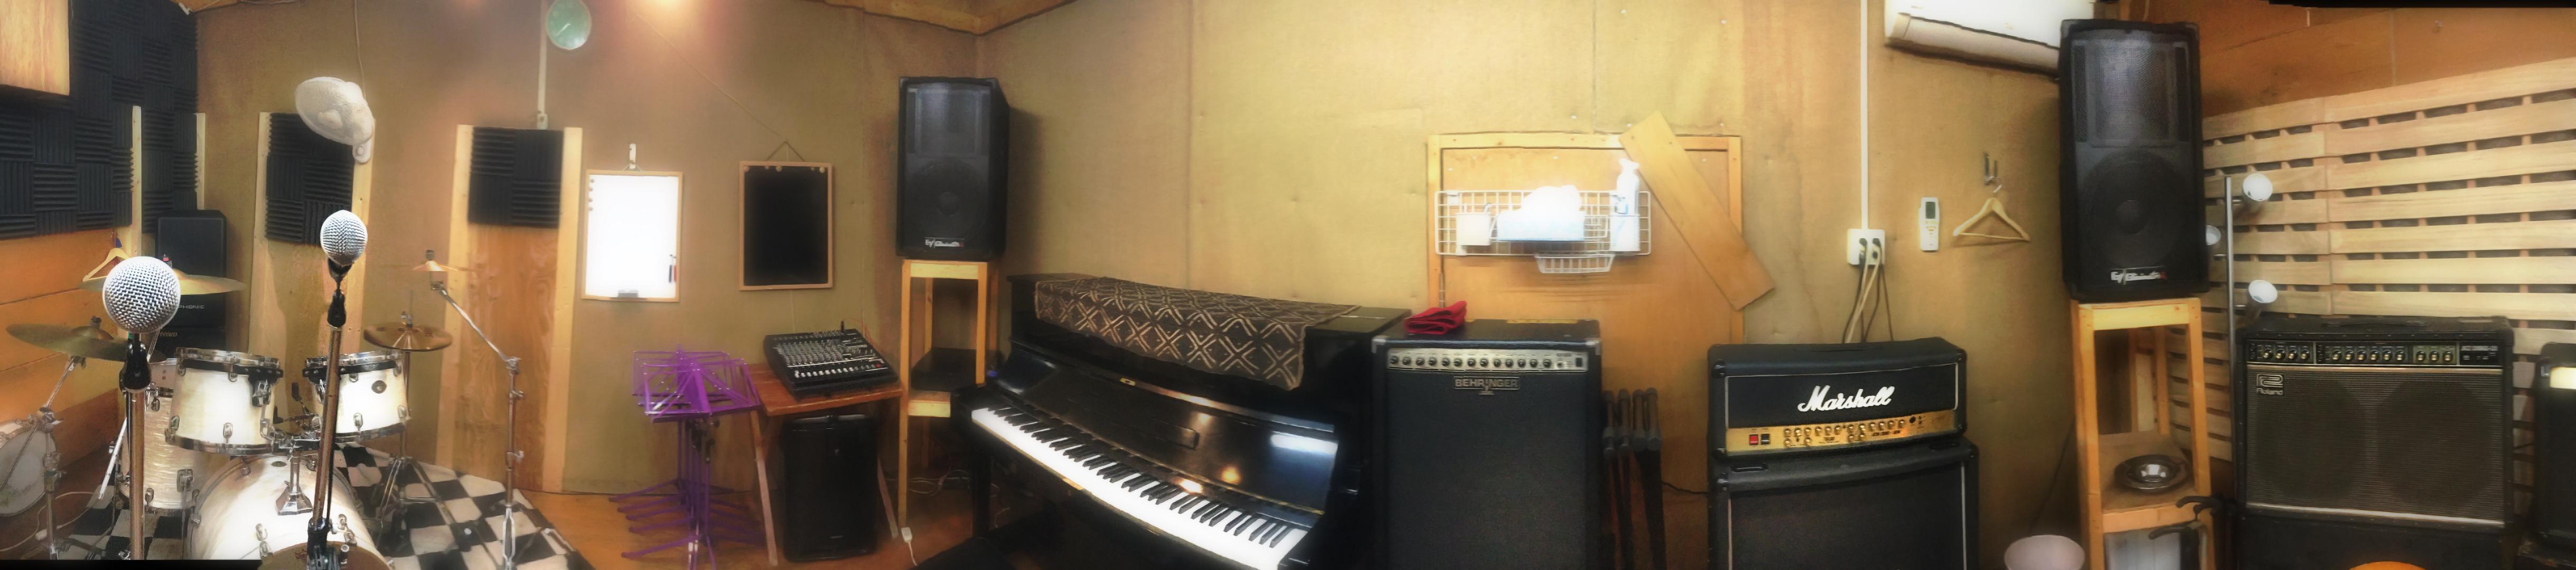 Kスタジオ K Sutudio